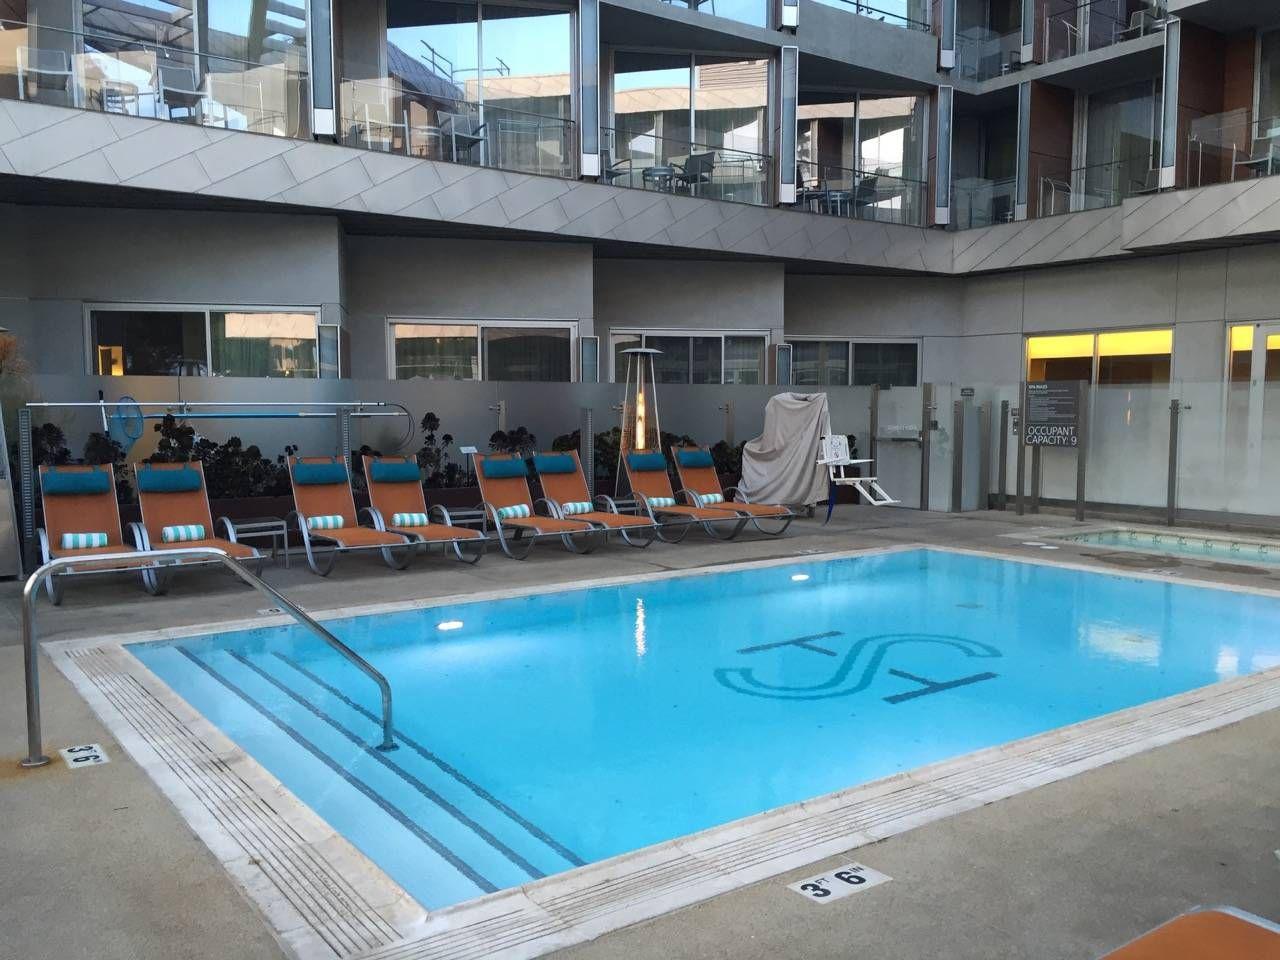 Shore Hotel Santa Monica-022